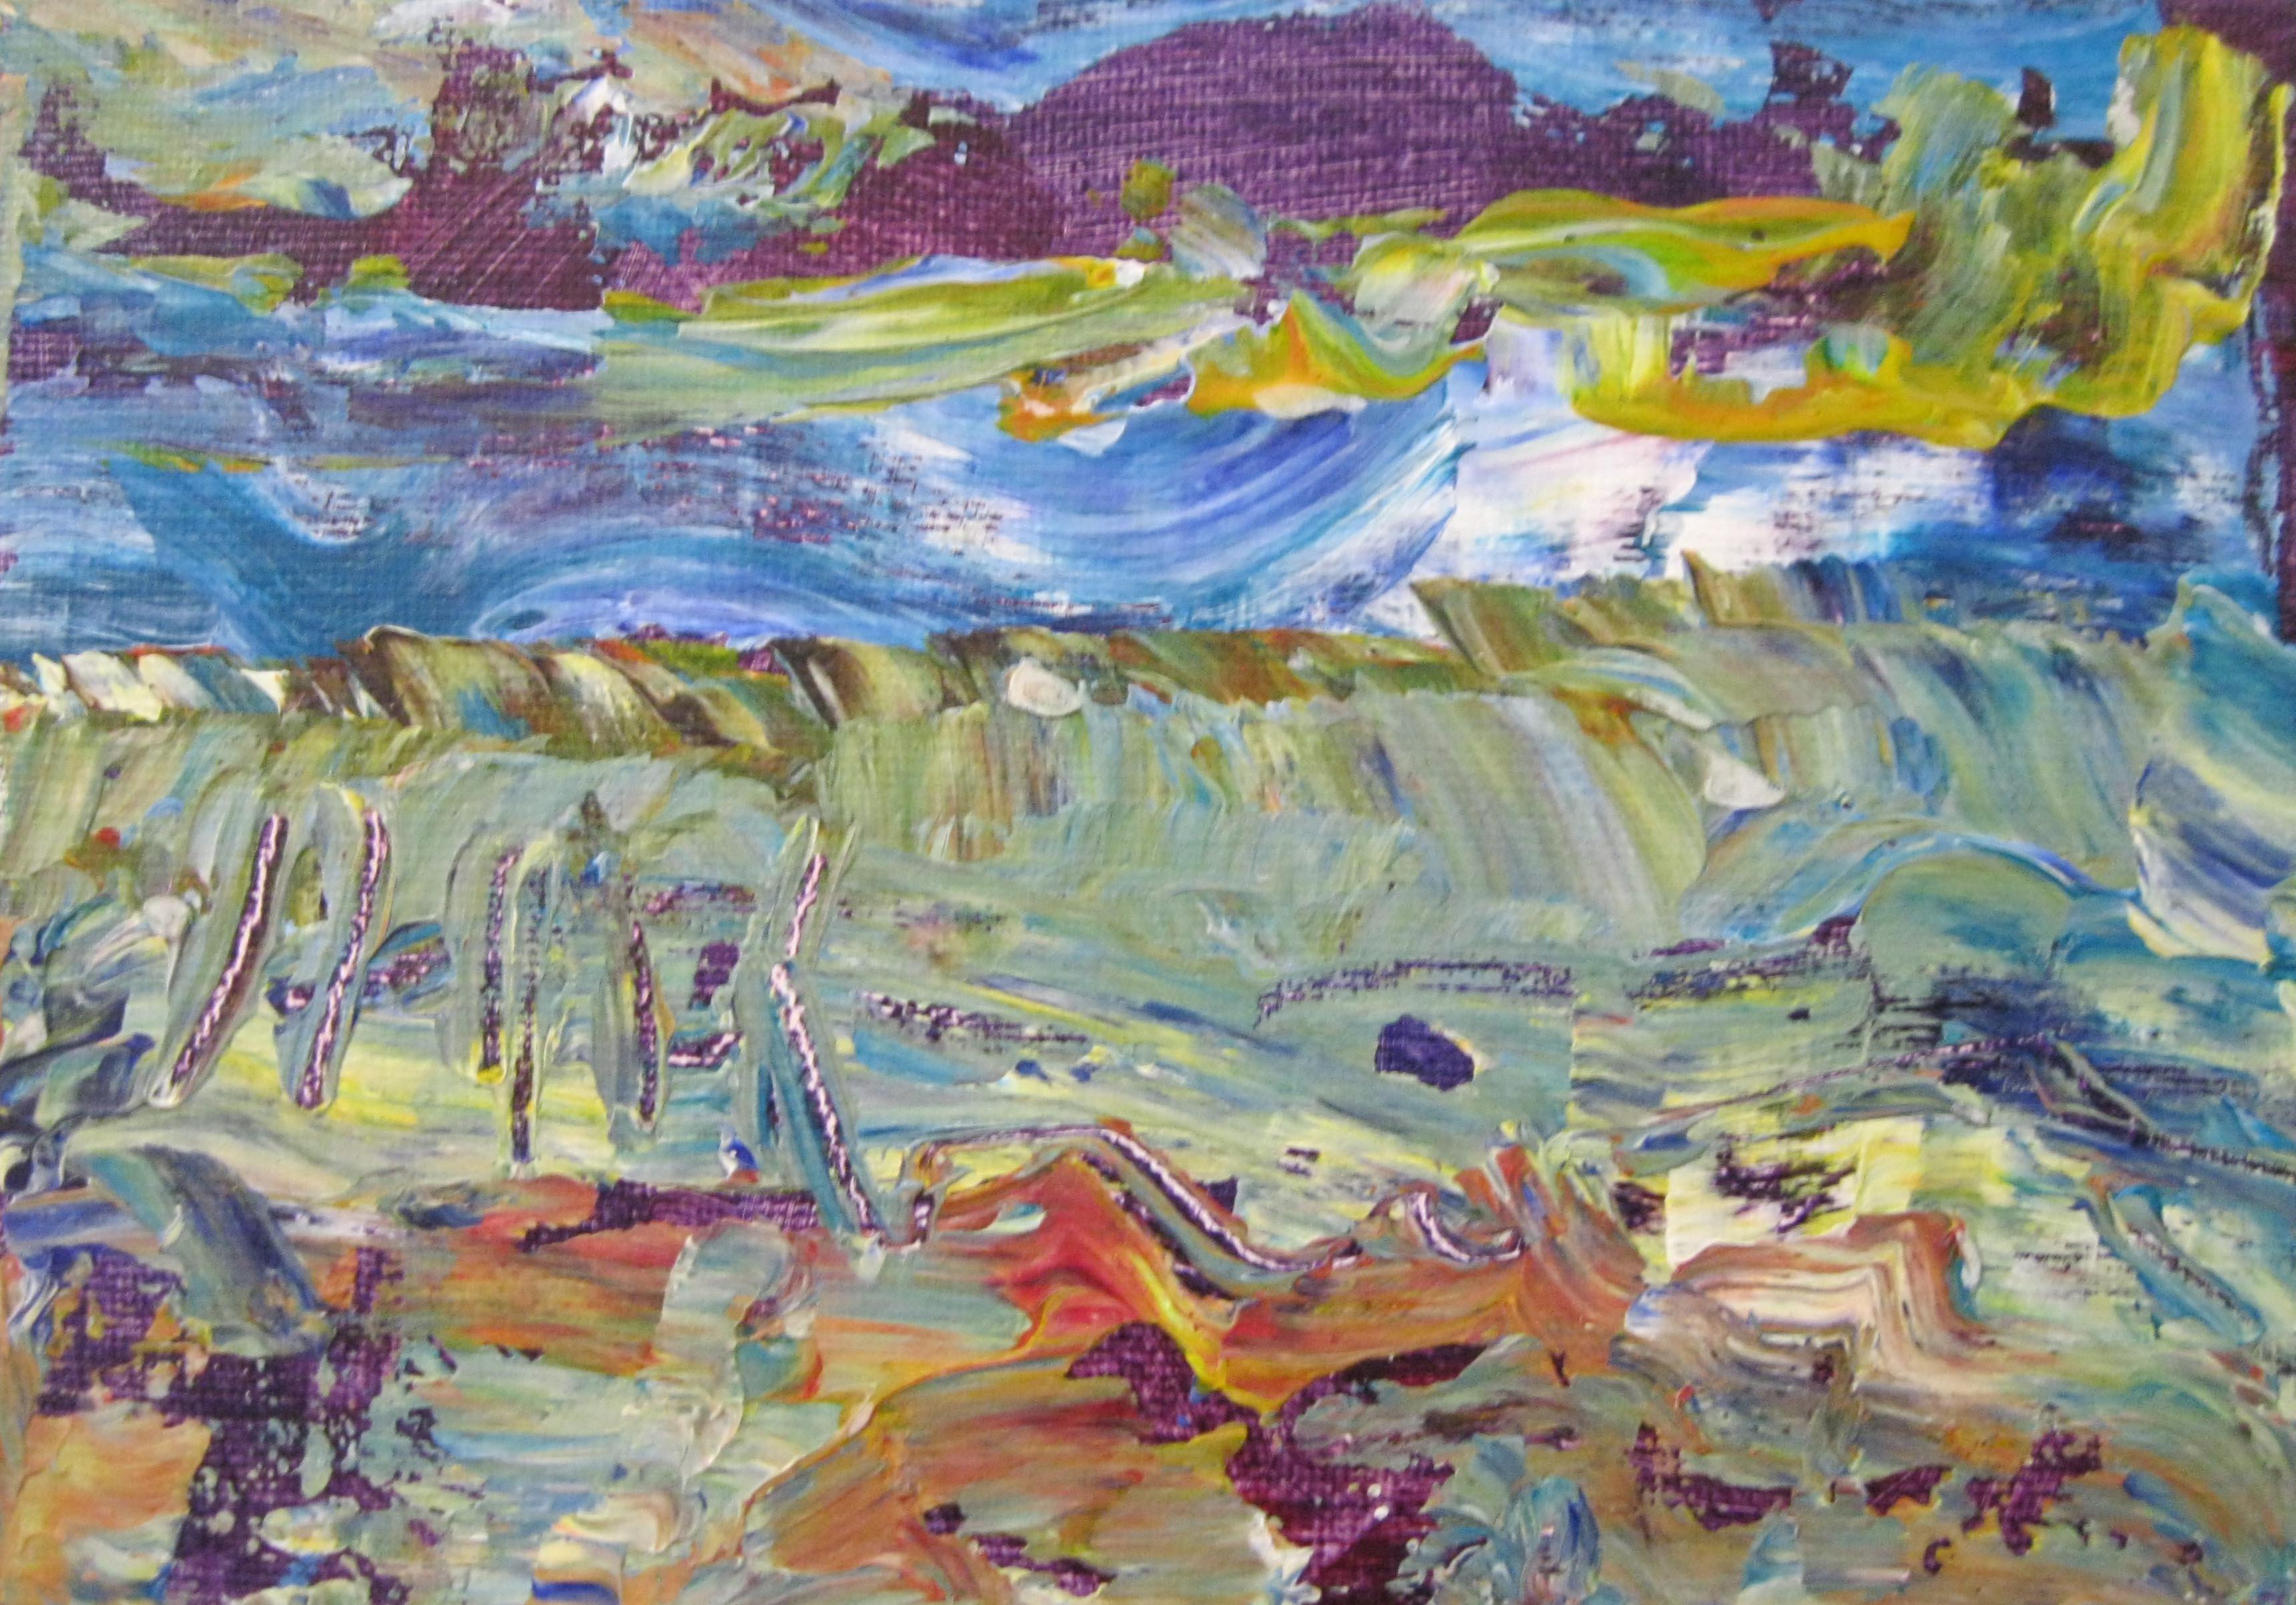 Abstract Sea and Shore